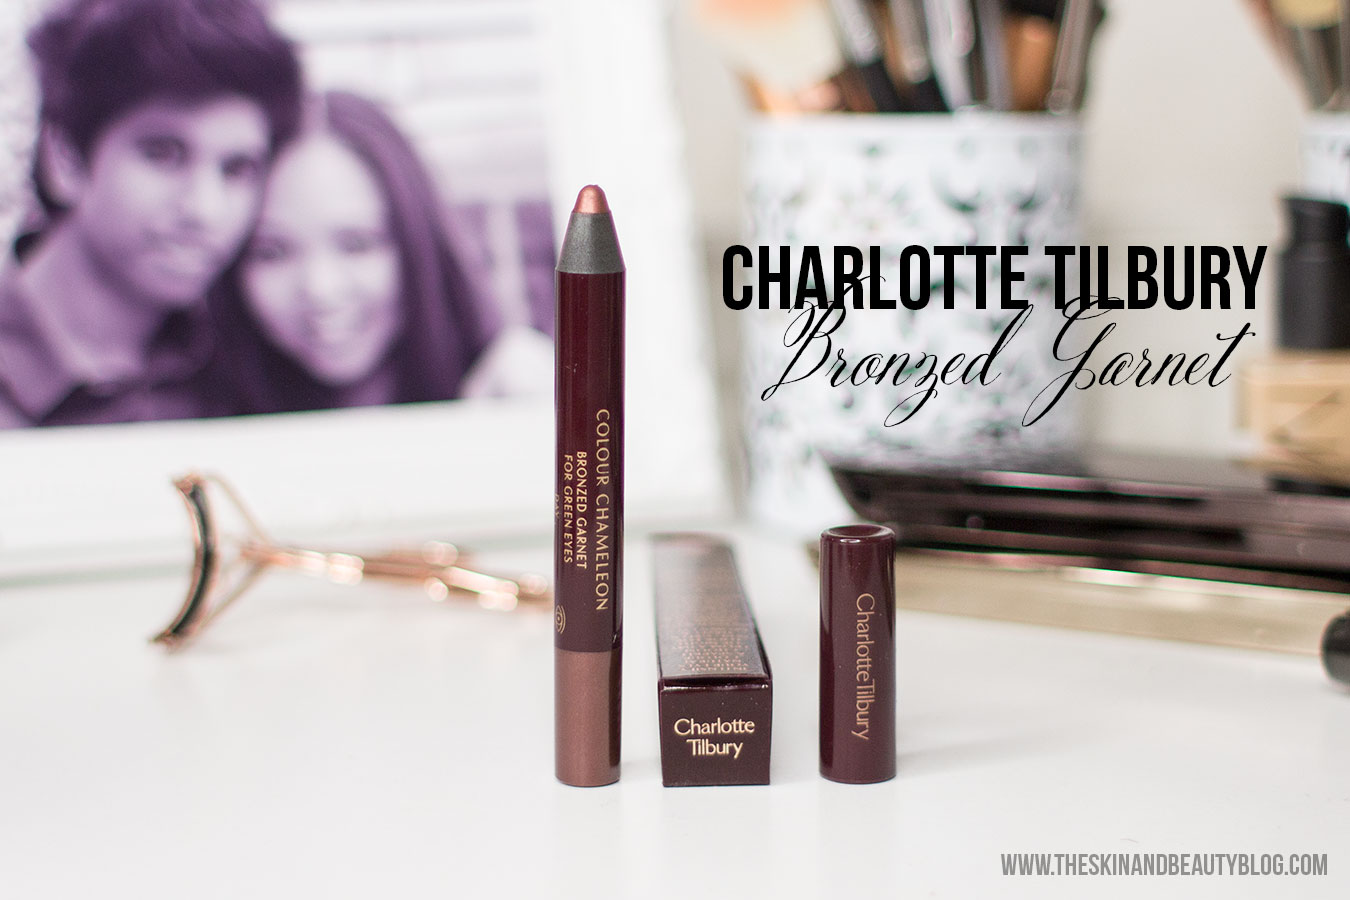 Charlotte Tilbury Colour Chameleon in Bronzed Garnet Review, Swatches